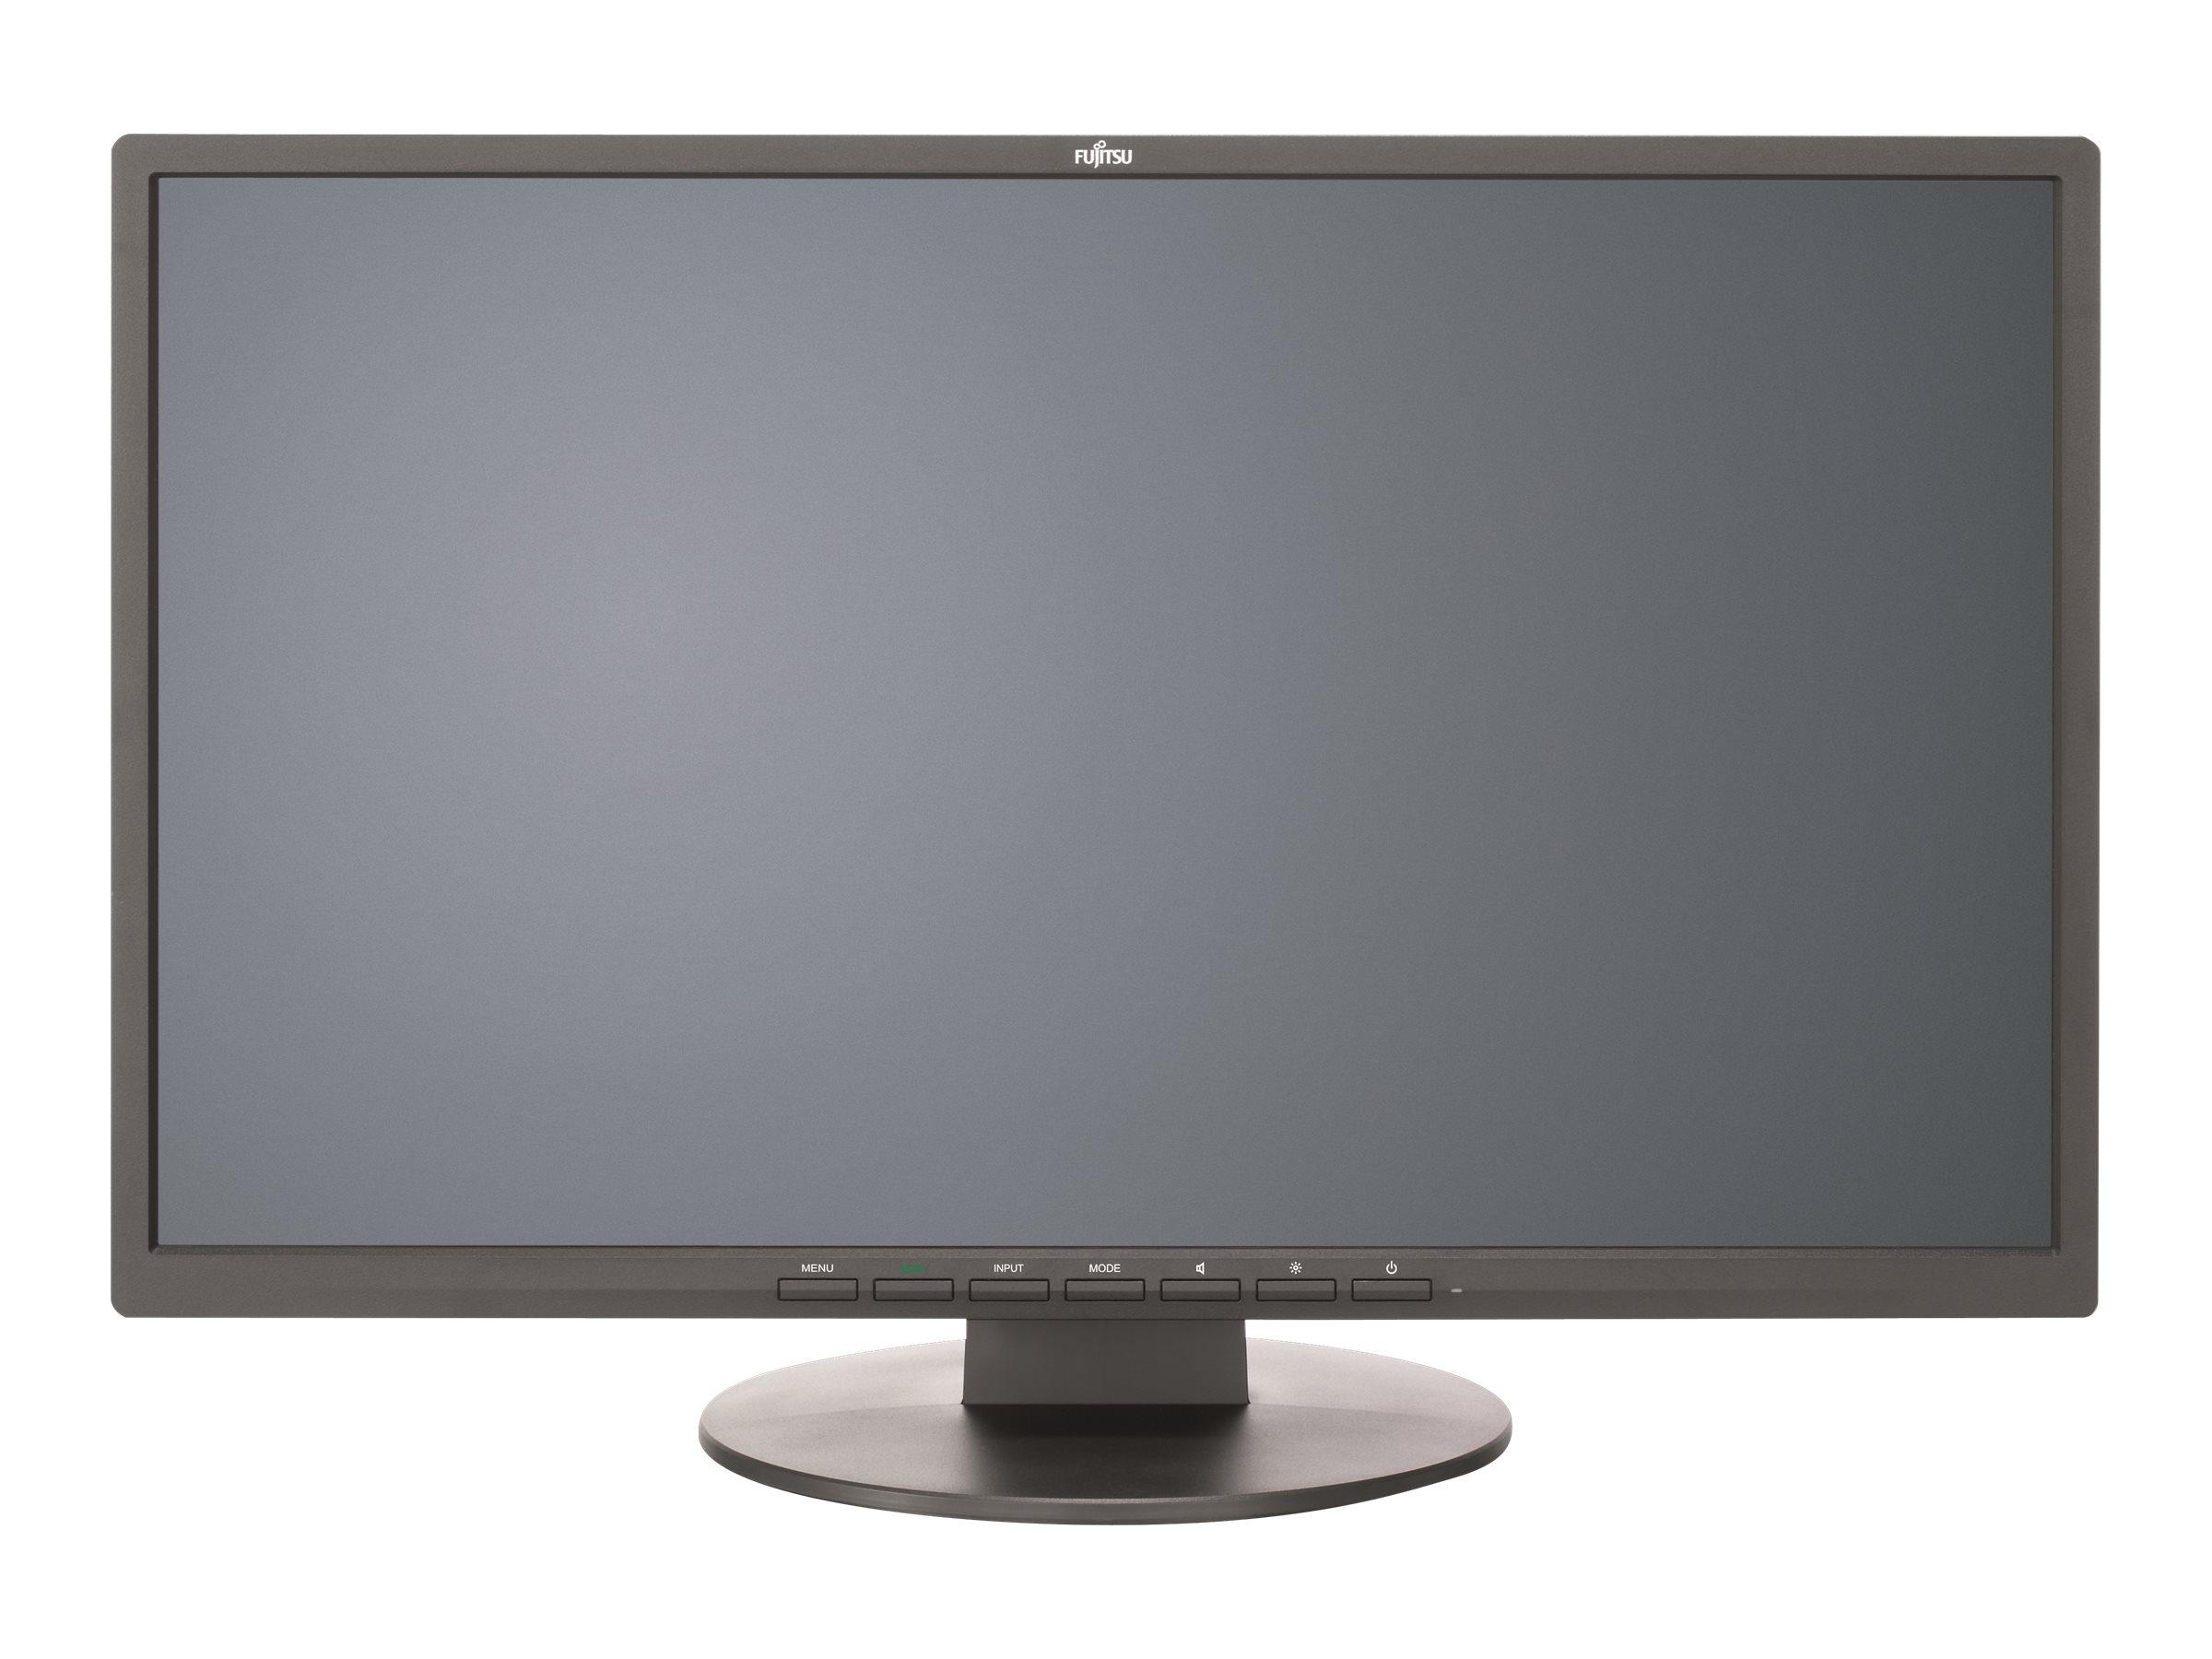 Fujitsu E22-8 TS Pro - LED-Monitor - 54.6 cm (21.5